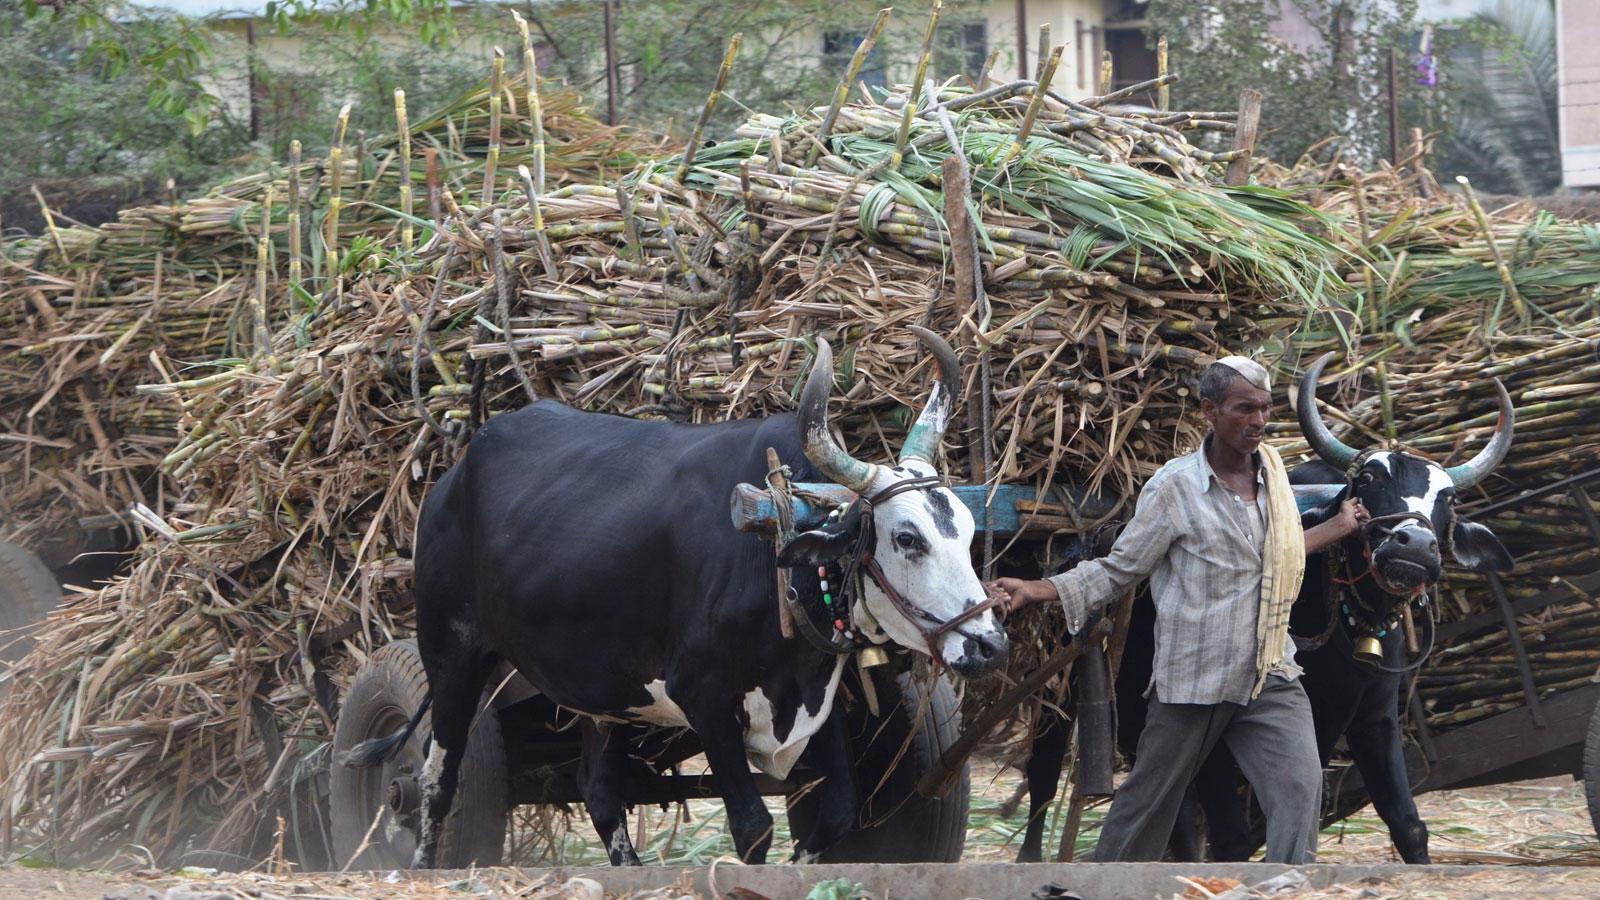 Farmers are busy with sugarcane harvest in western Maharashtra (Photo: Rahul Gayakwad)